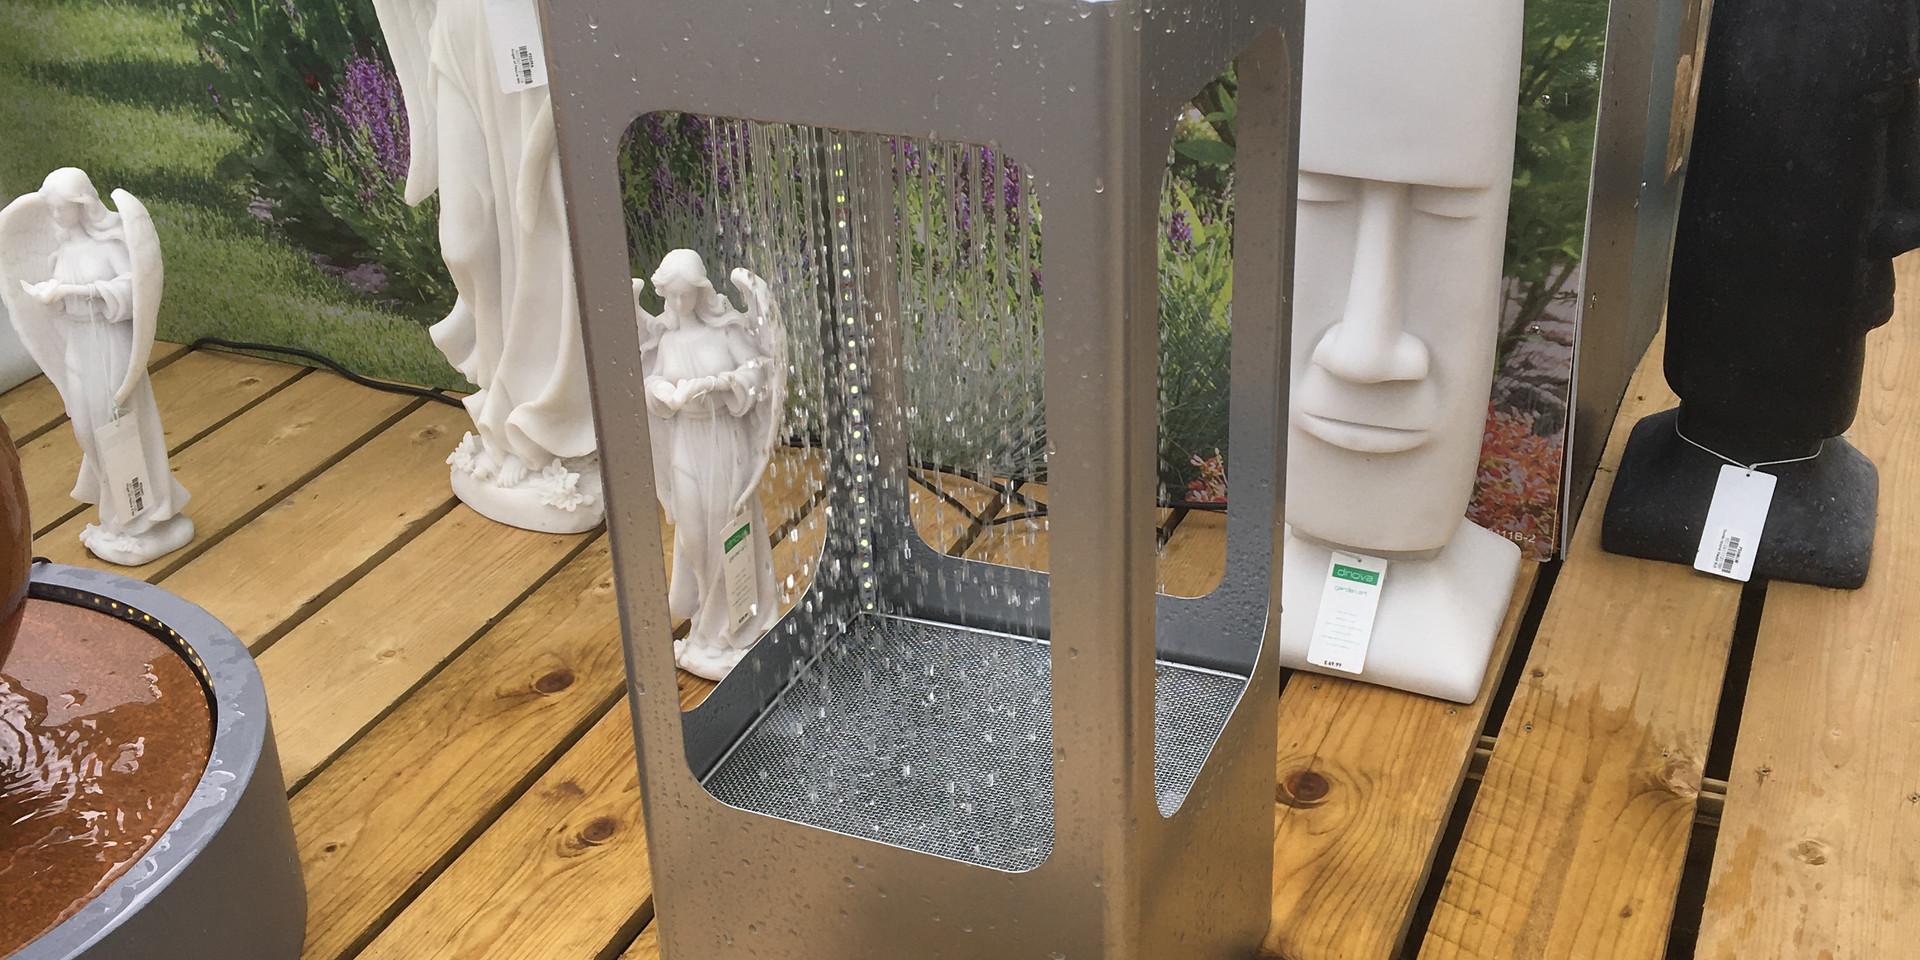 Raining sphere £349.99